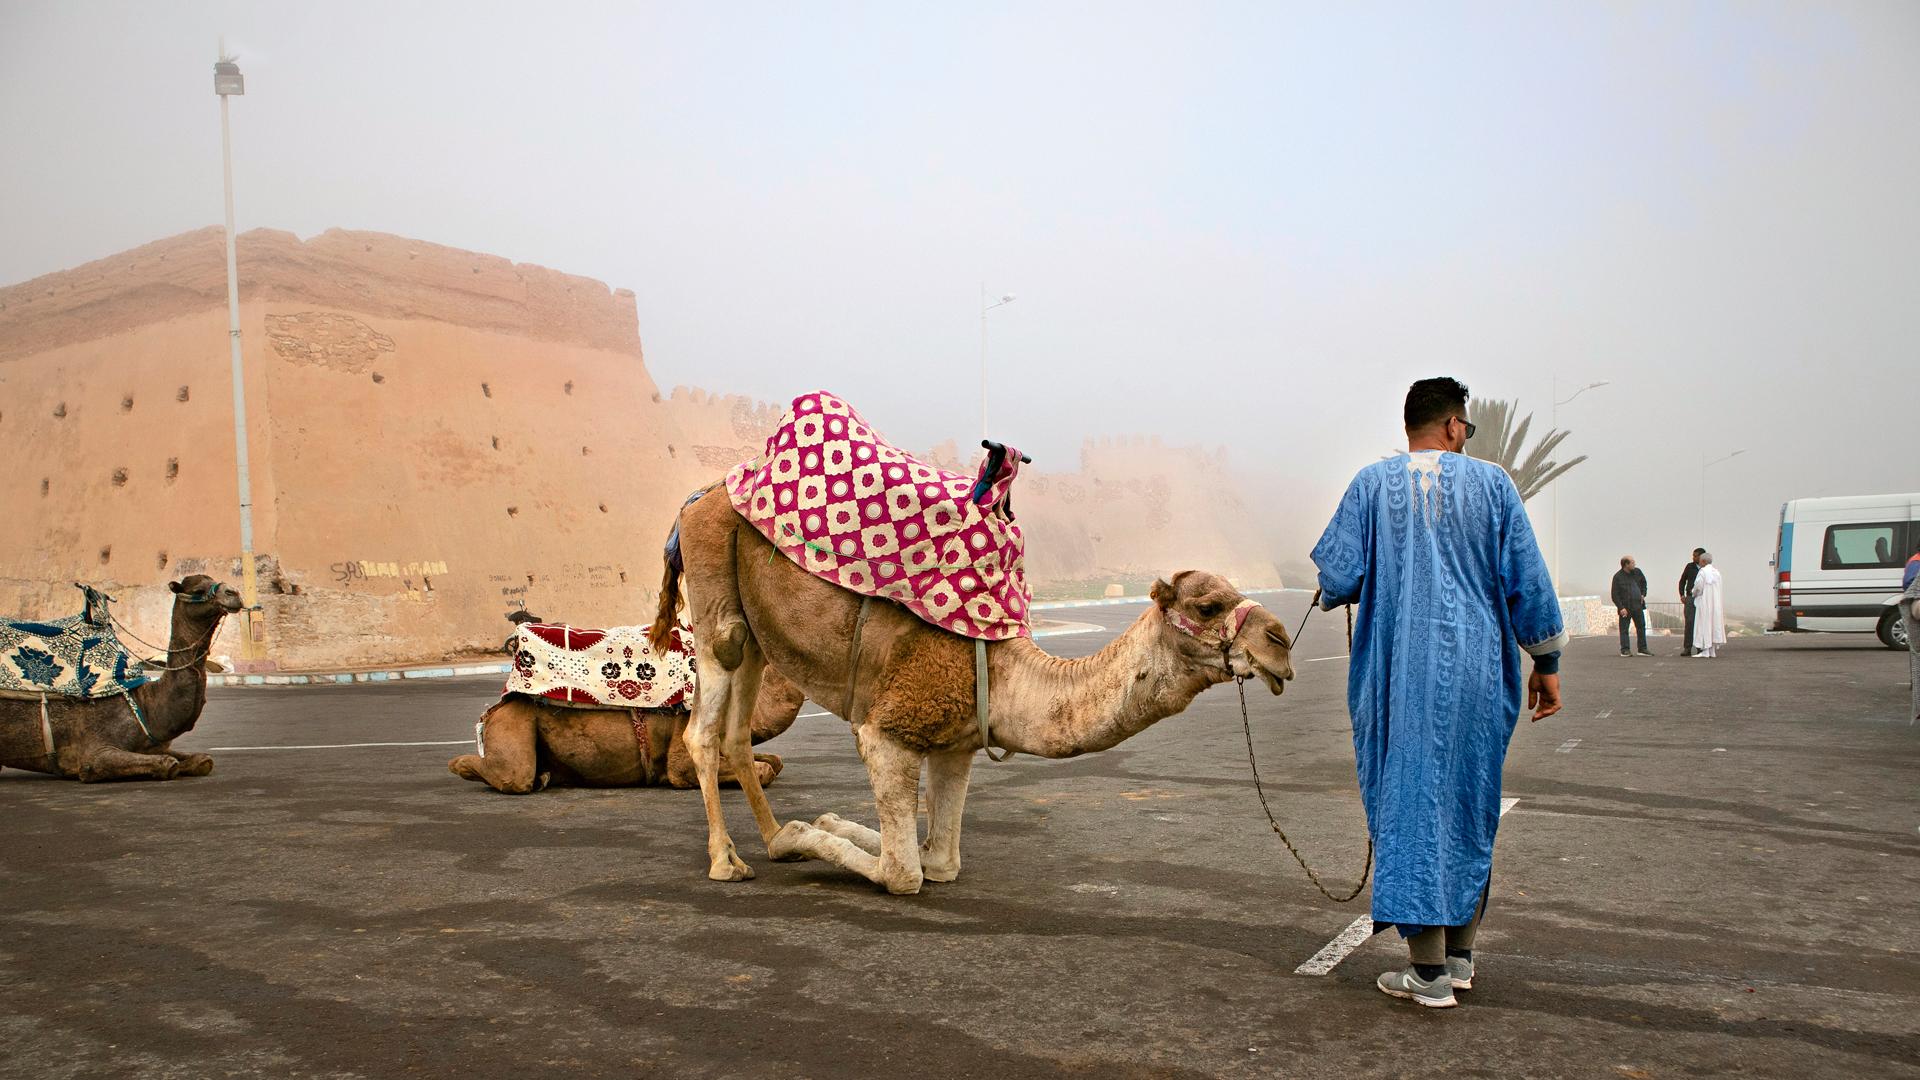 Kashabin kameliajelu